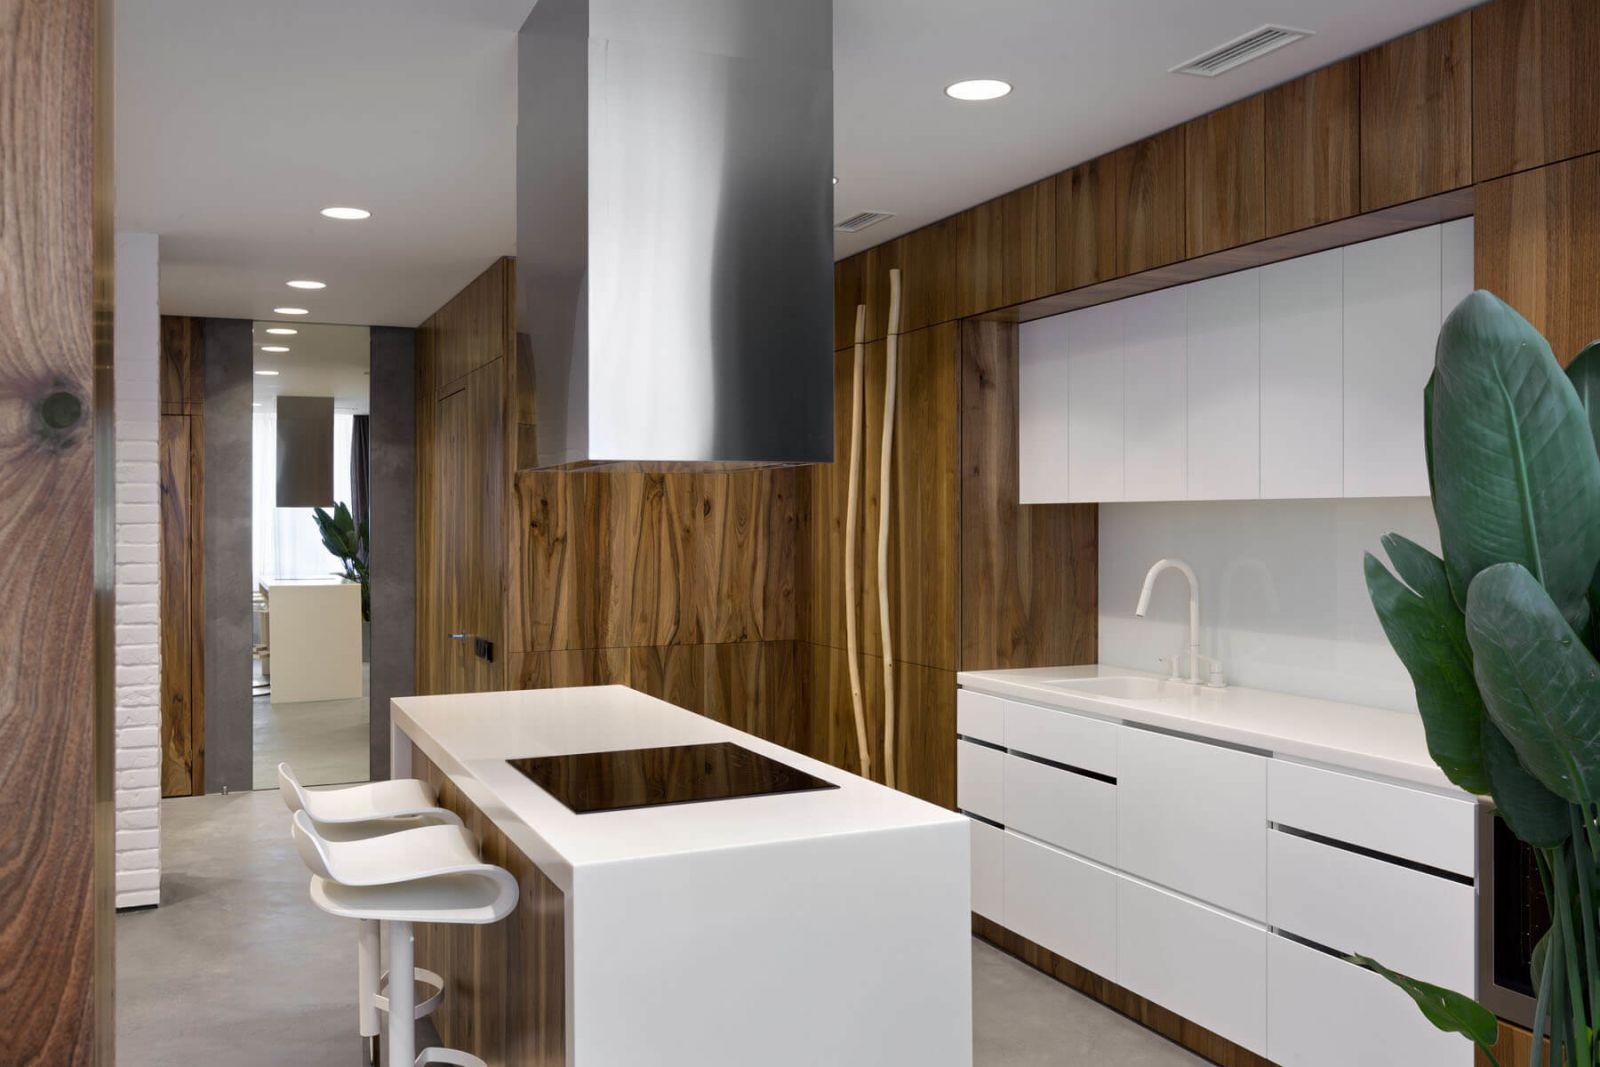 Вся кухонная техника спрятана за деревянными панелями